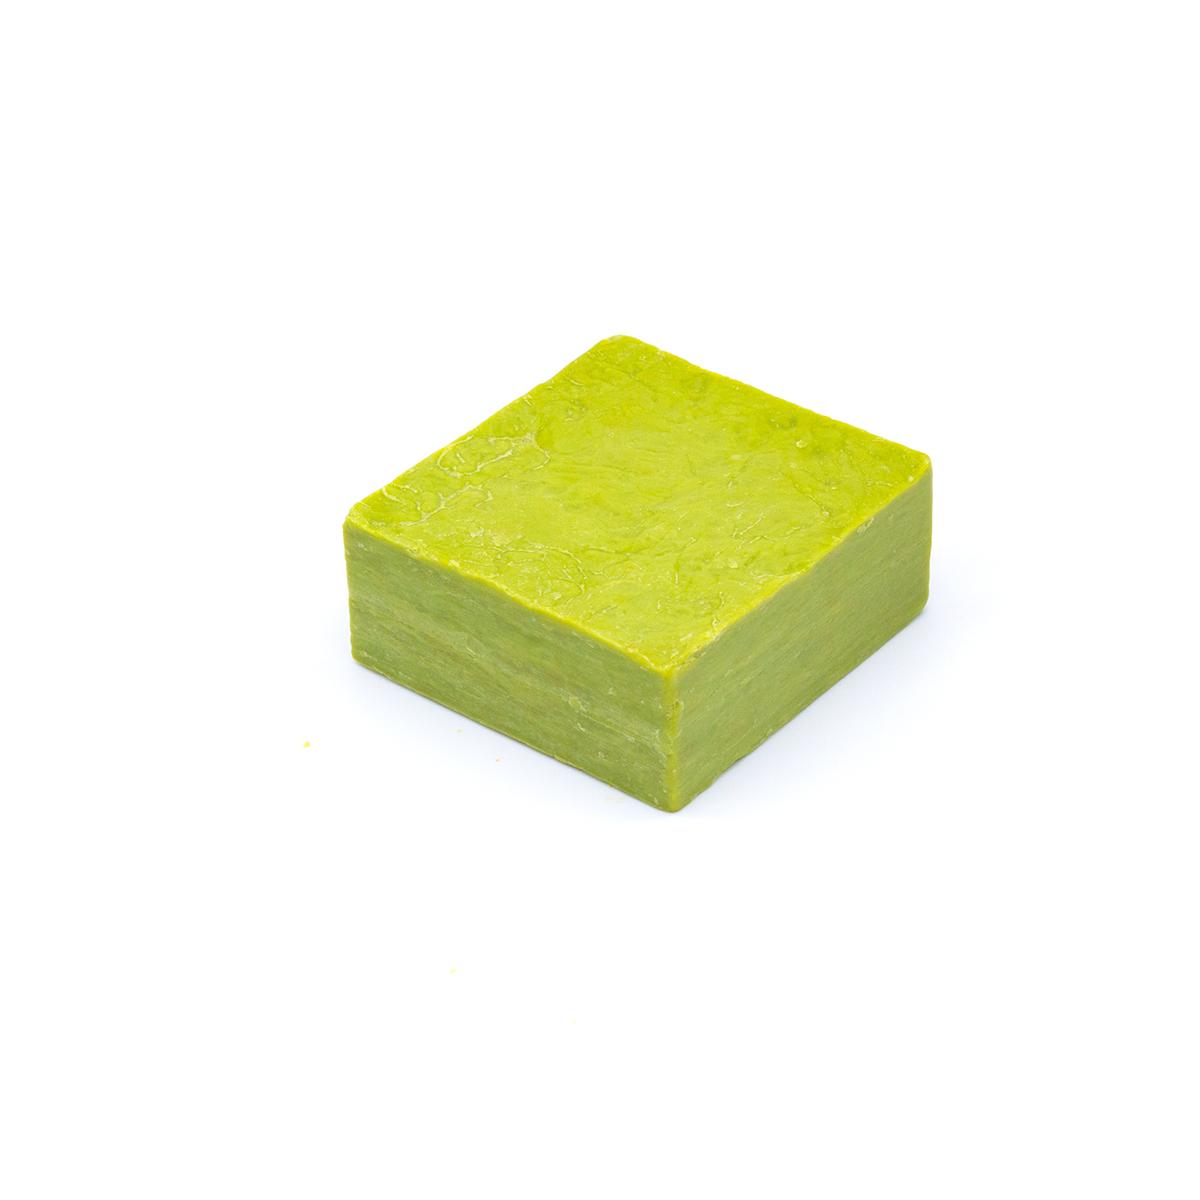 Натурален сапун от маслиново масло